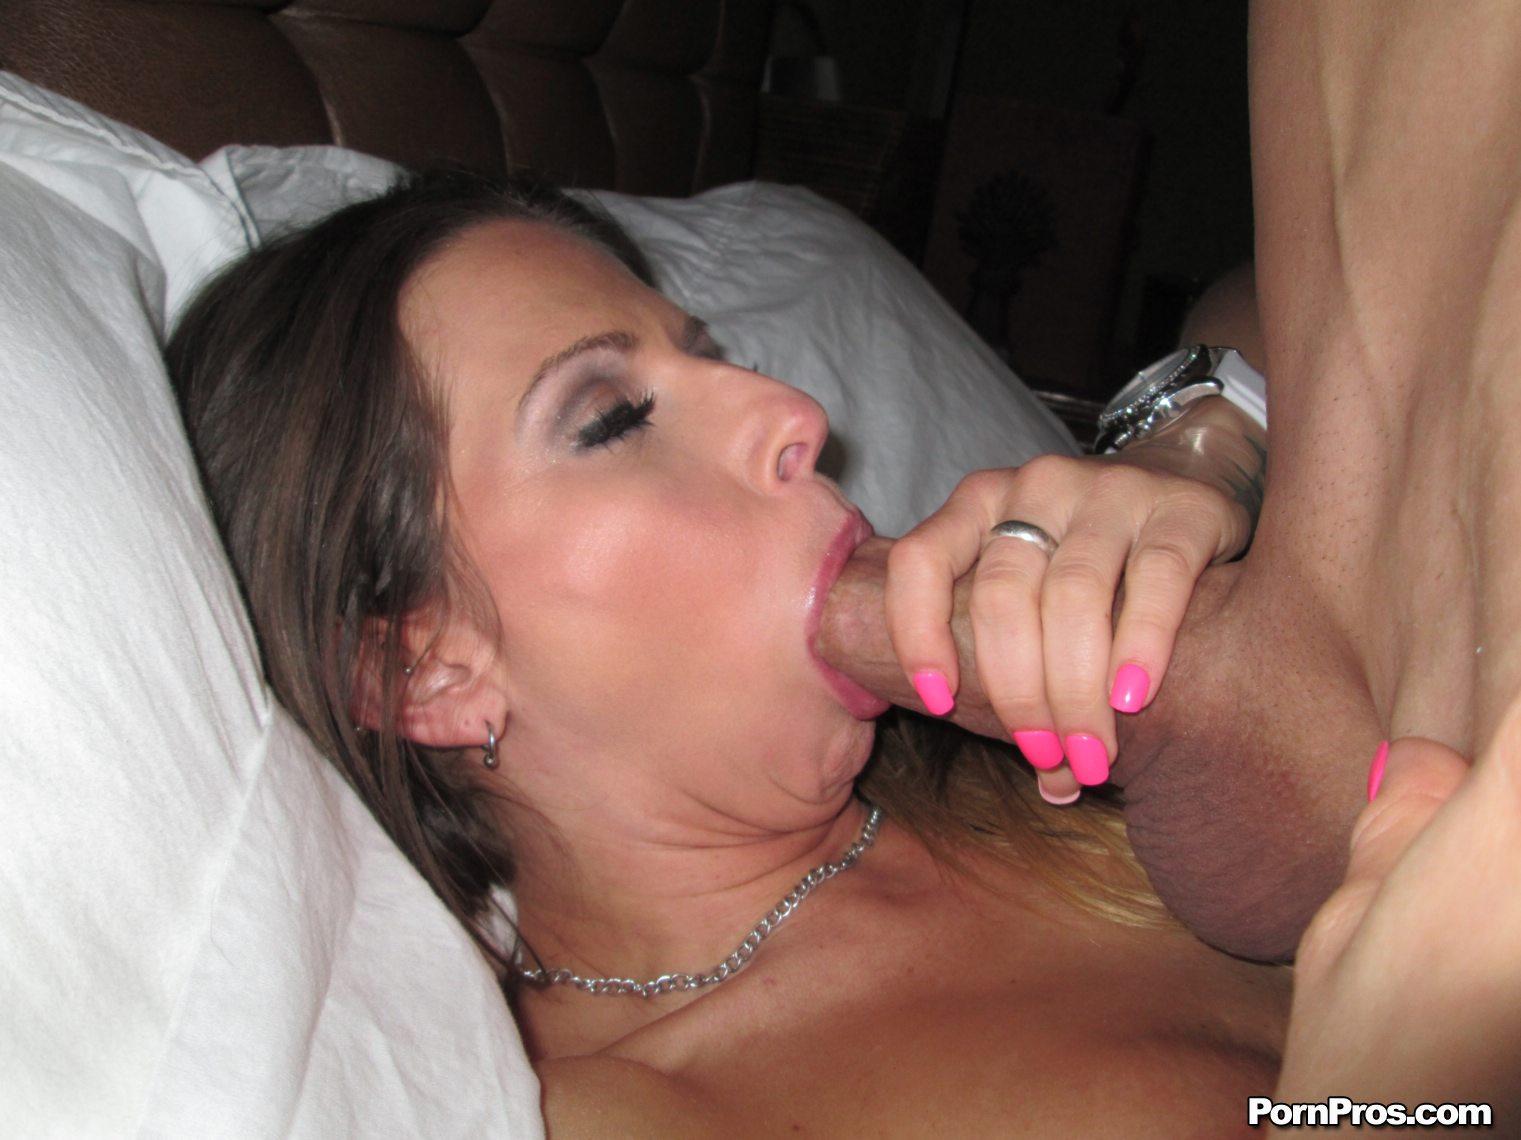 Pro porn sucking dick sex thanks